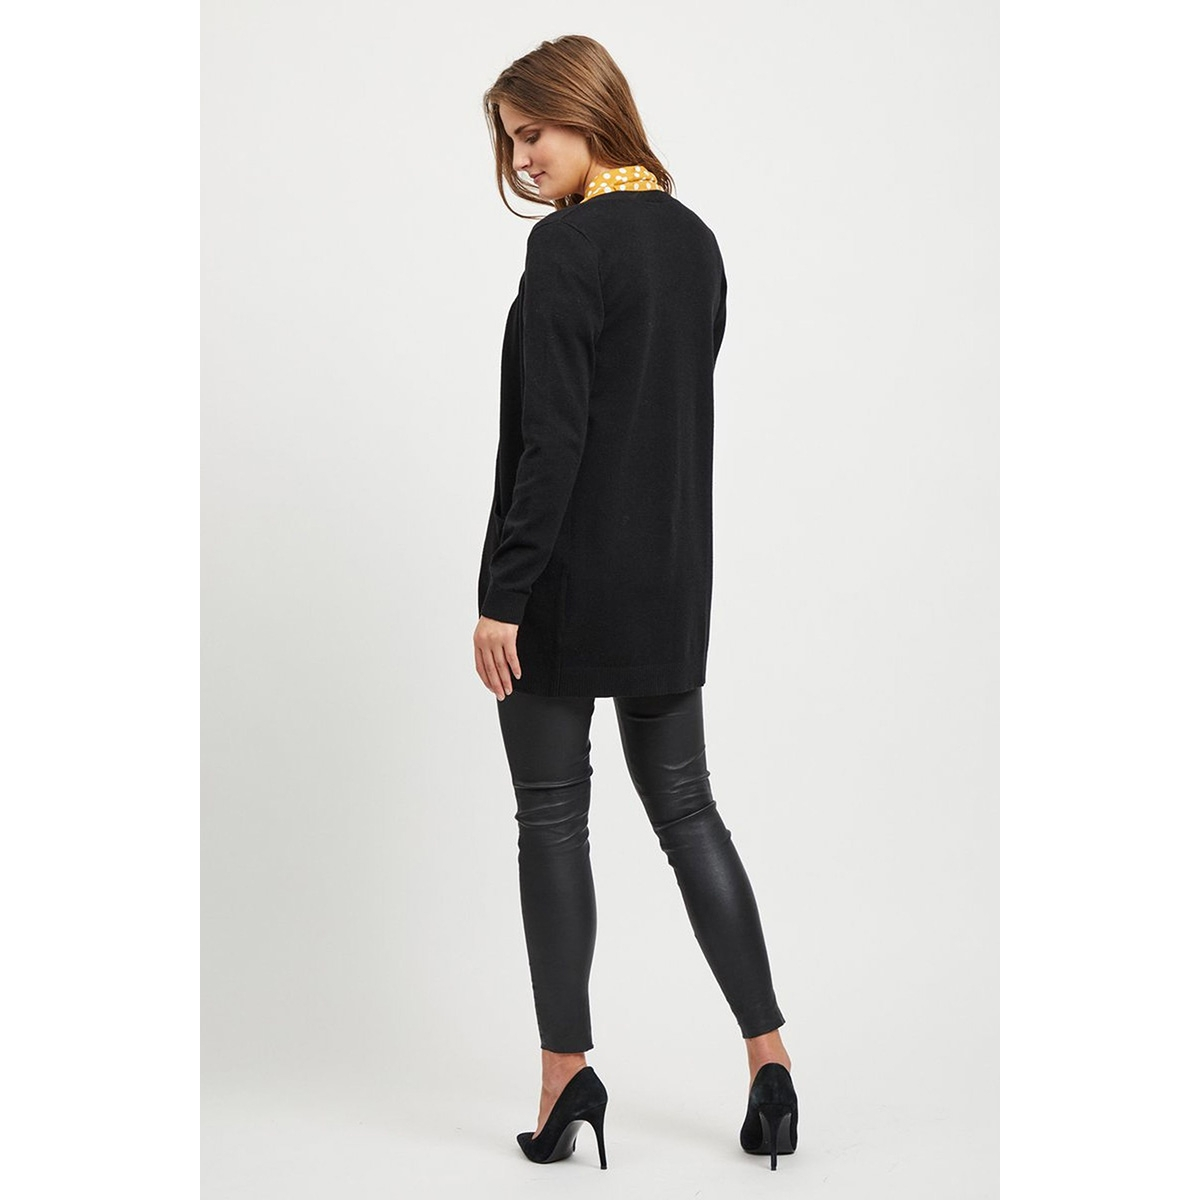 objthess l/s cardigan noos 23028514 object vest black